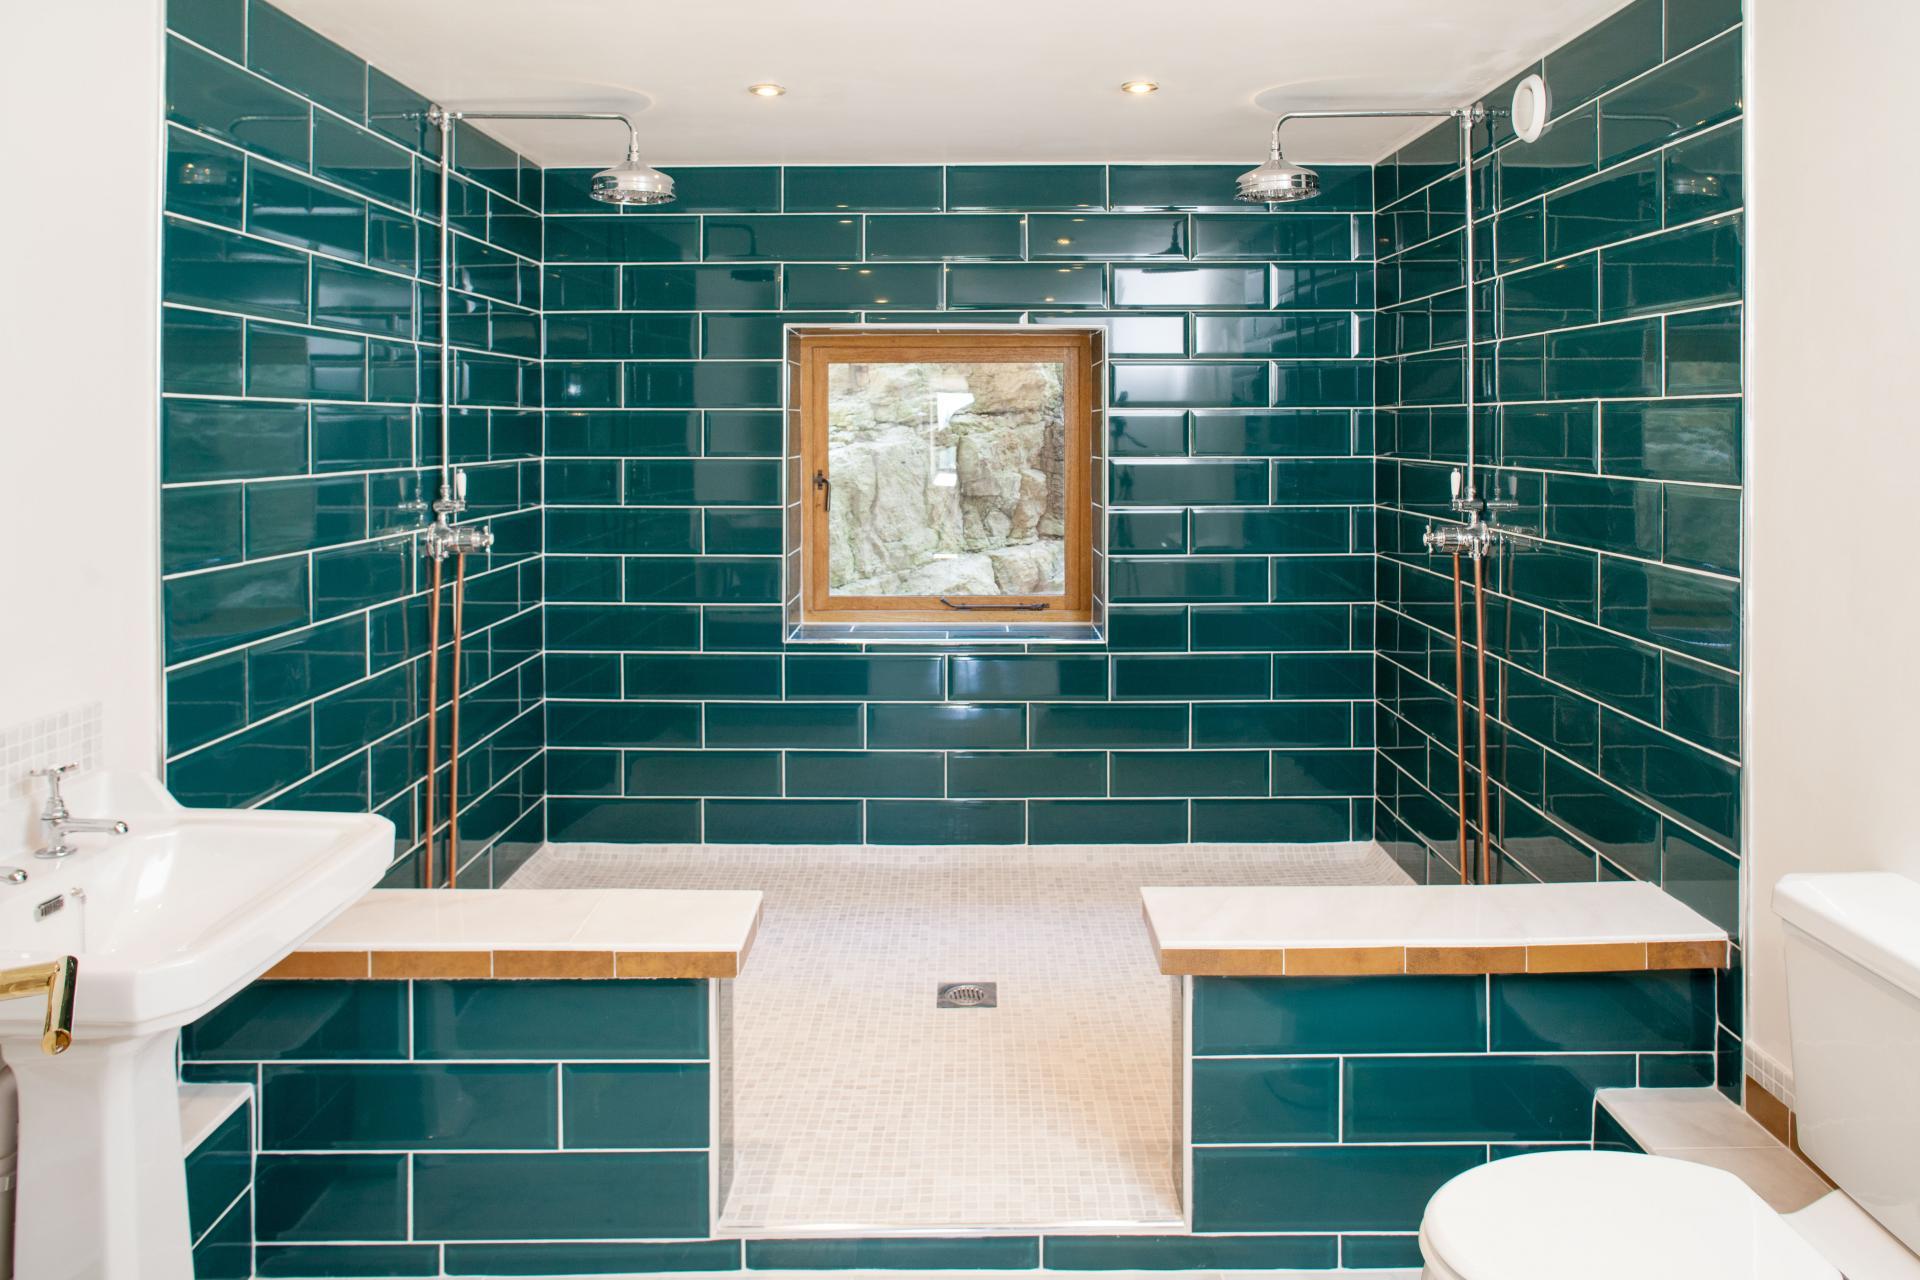 Charltons Estate Agents & Splashing Out: Bathroom Bliss - Splashing Out: Bathroom Bliss